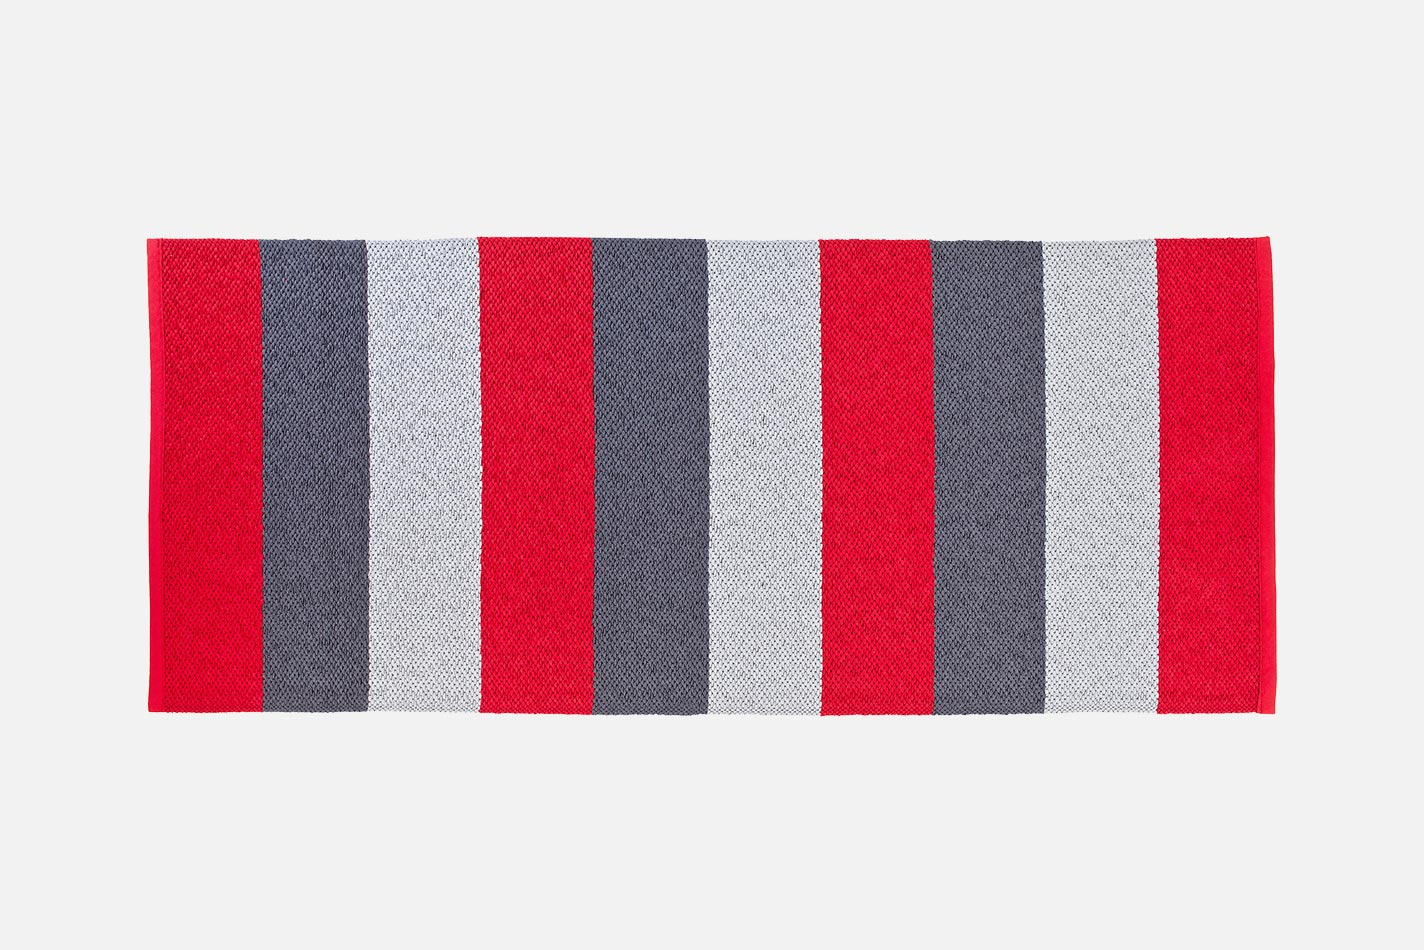 Pinja-red_grey-64_66_78-pien-1